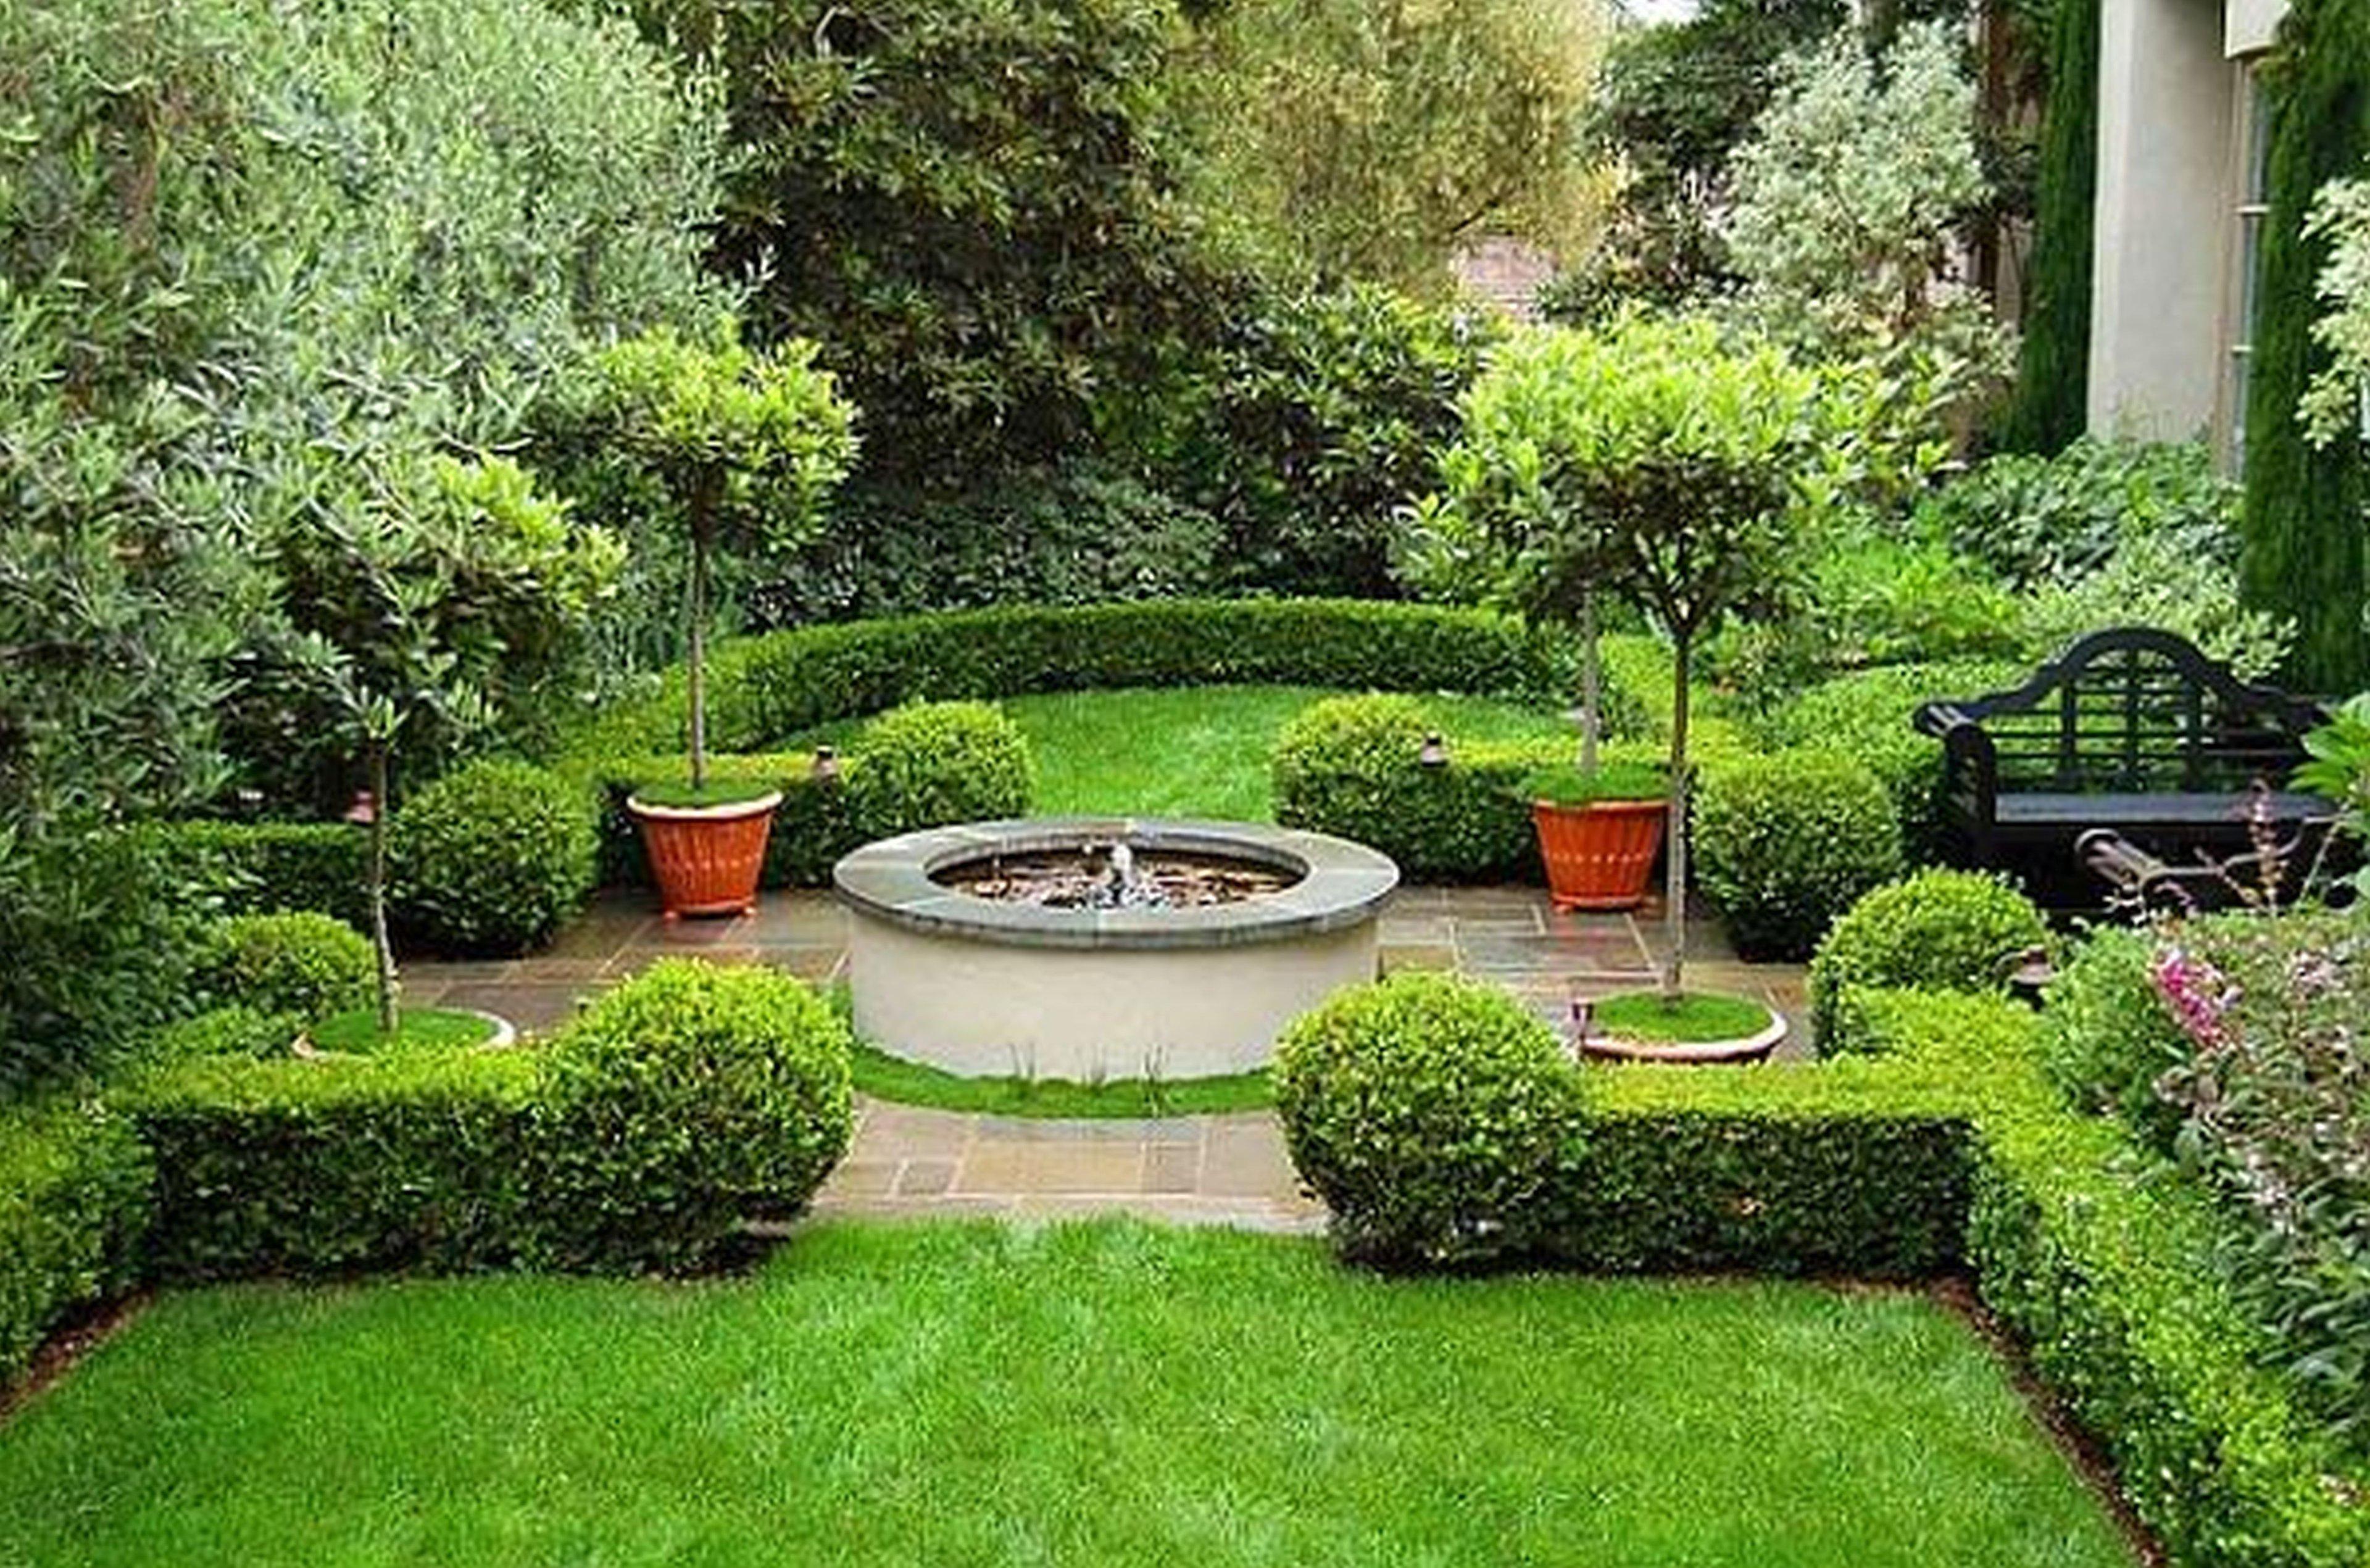 gramado pequenas areas canto aparar trapp pagina jardim potente